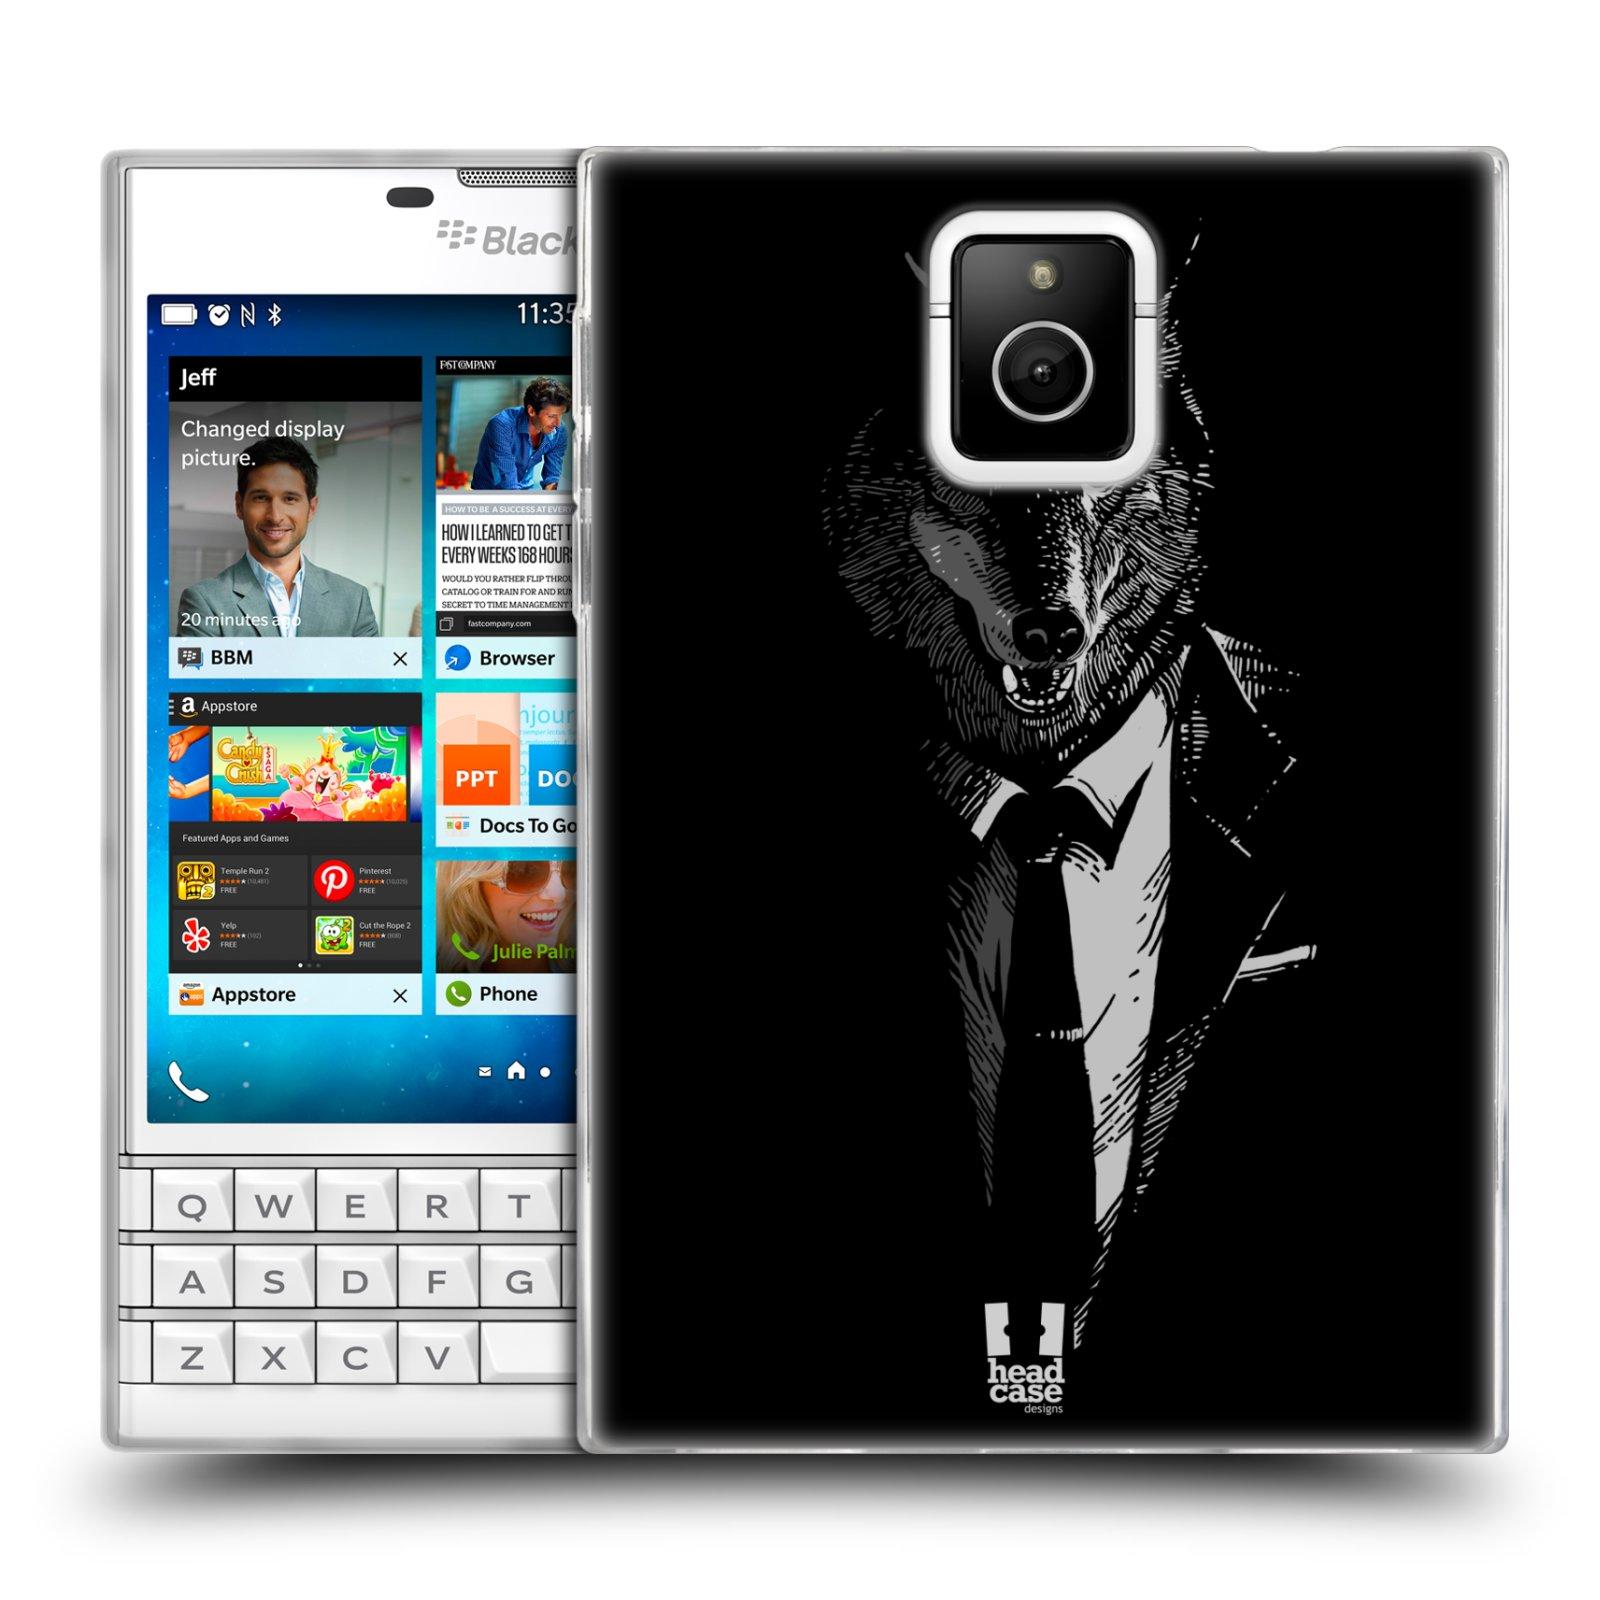 HEAD CASE silikonový obal na mobil Blackberry PASSPORT vzor Zvíře v obleku vlk